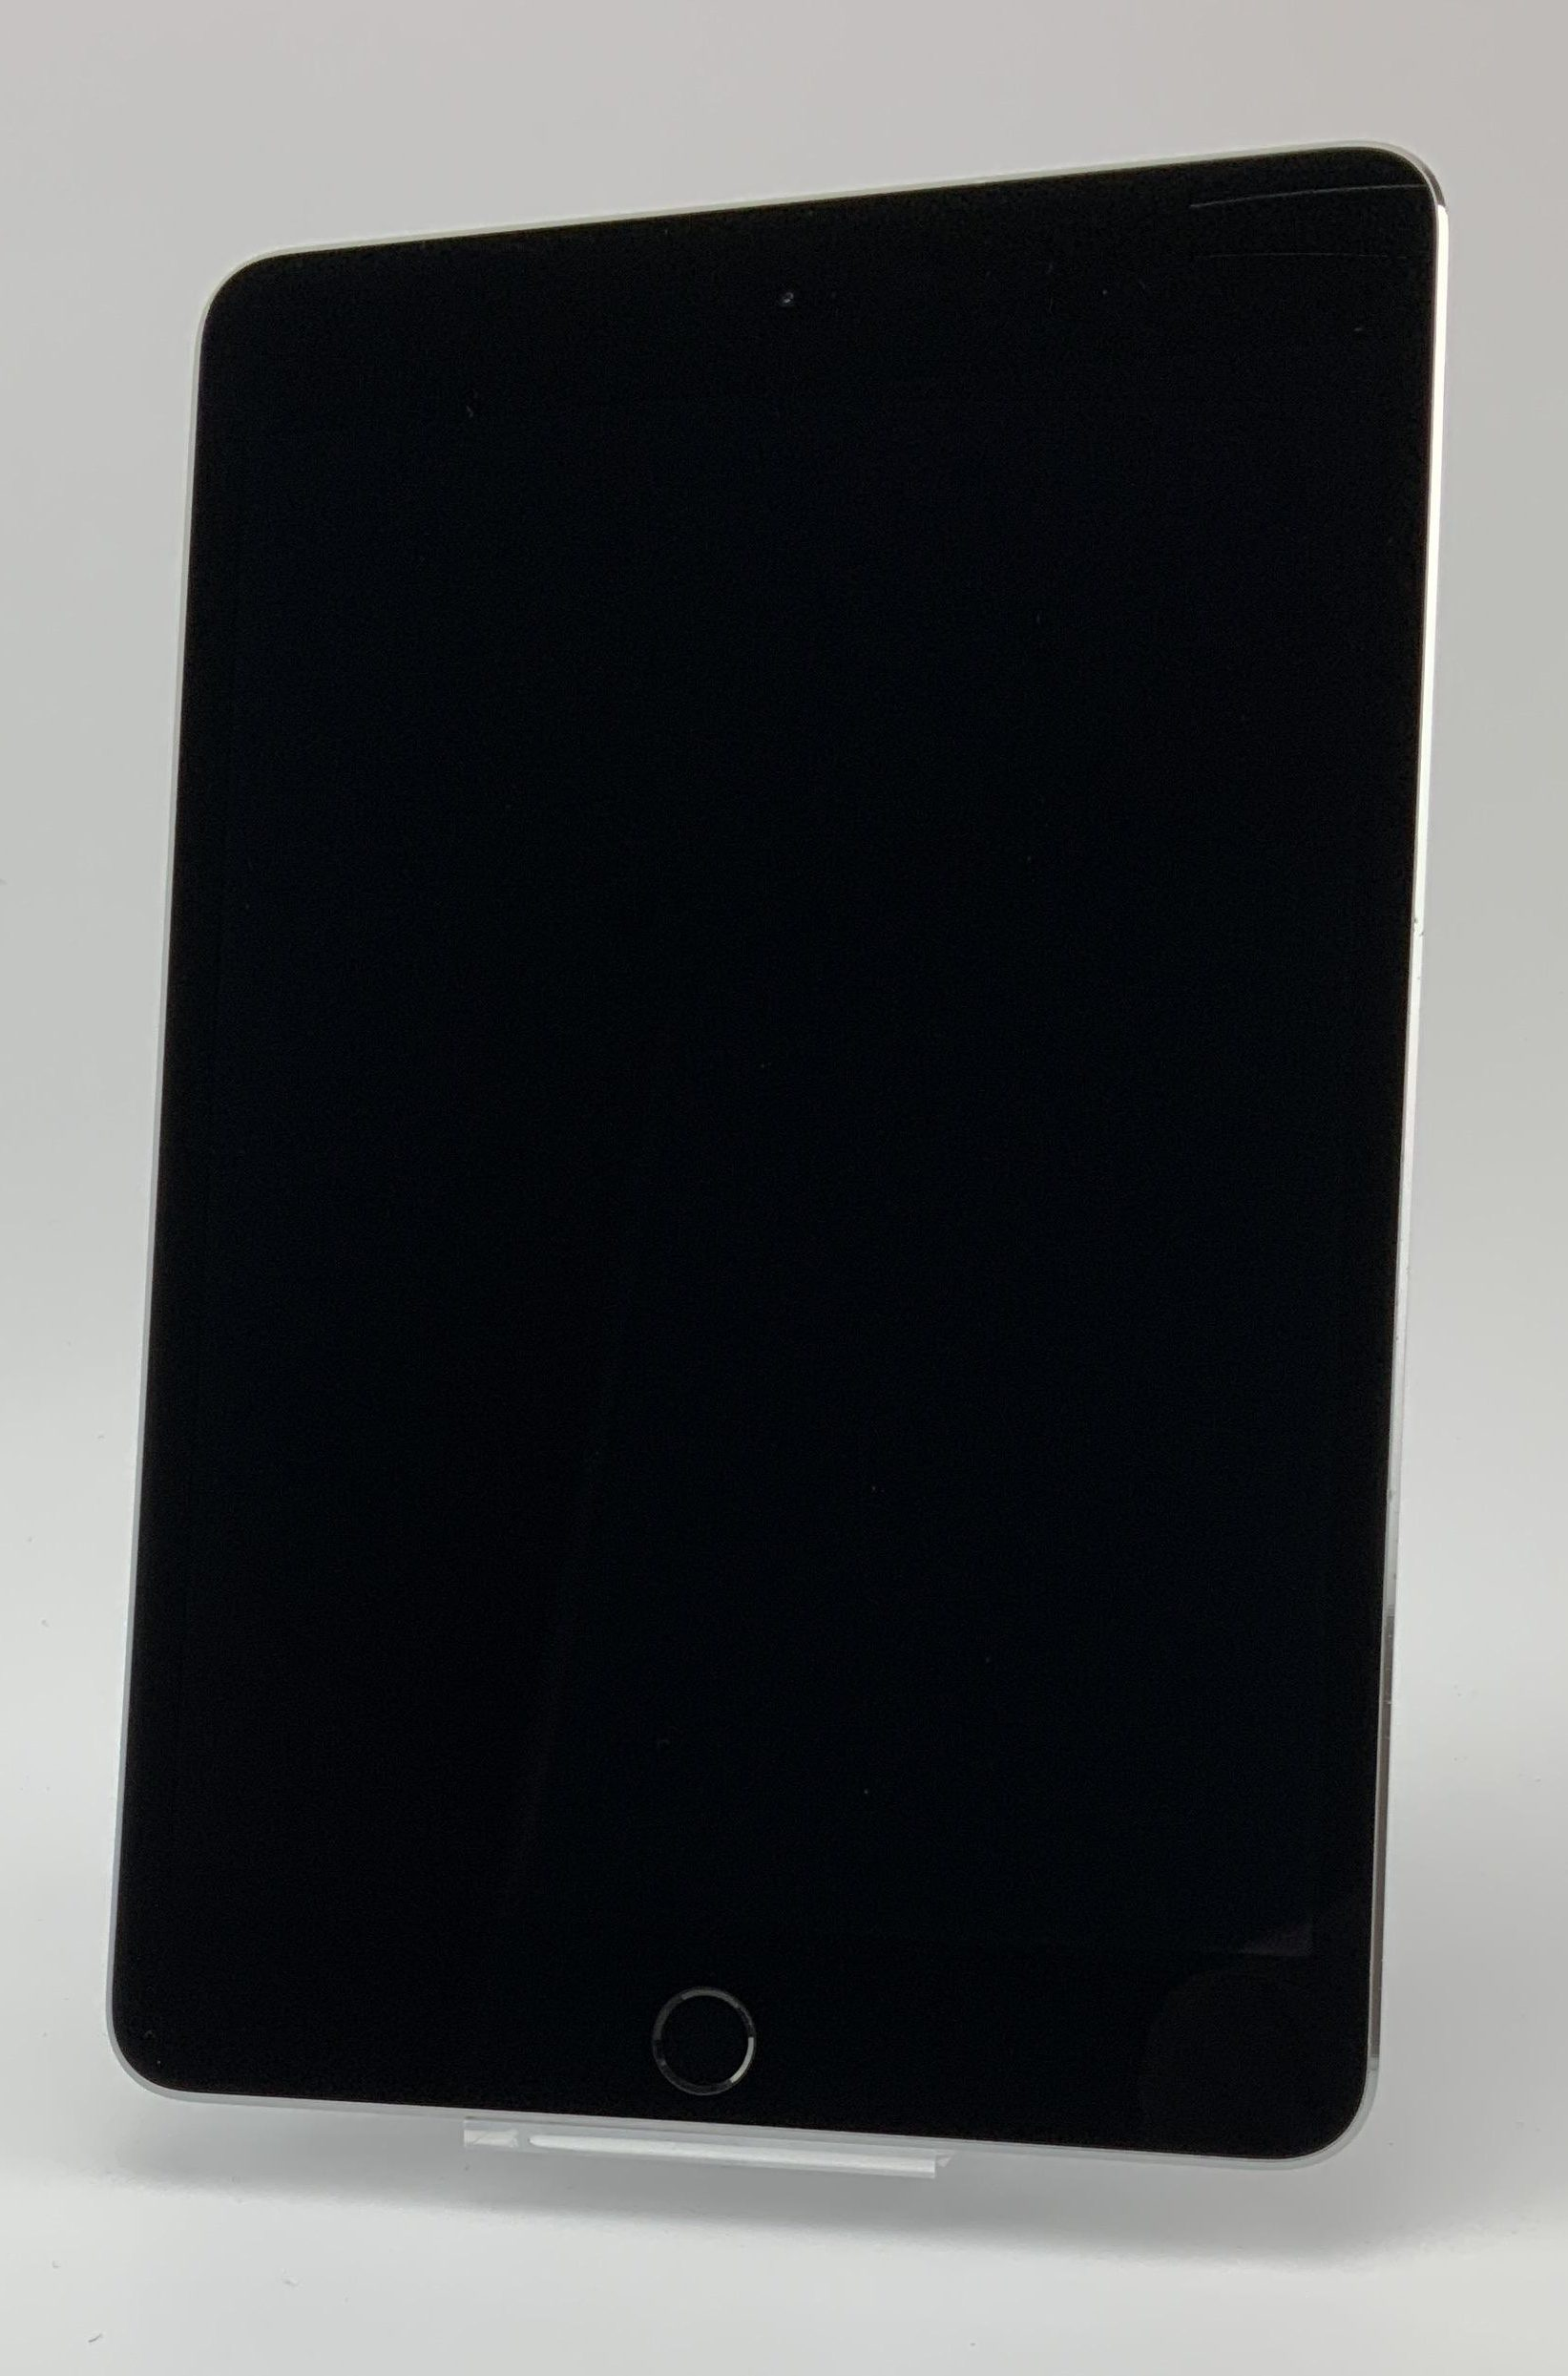 iPad mini 4 Wi-Fi 32GB, 32GB, Space Gray, immagine 5